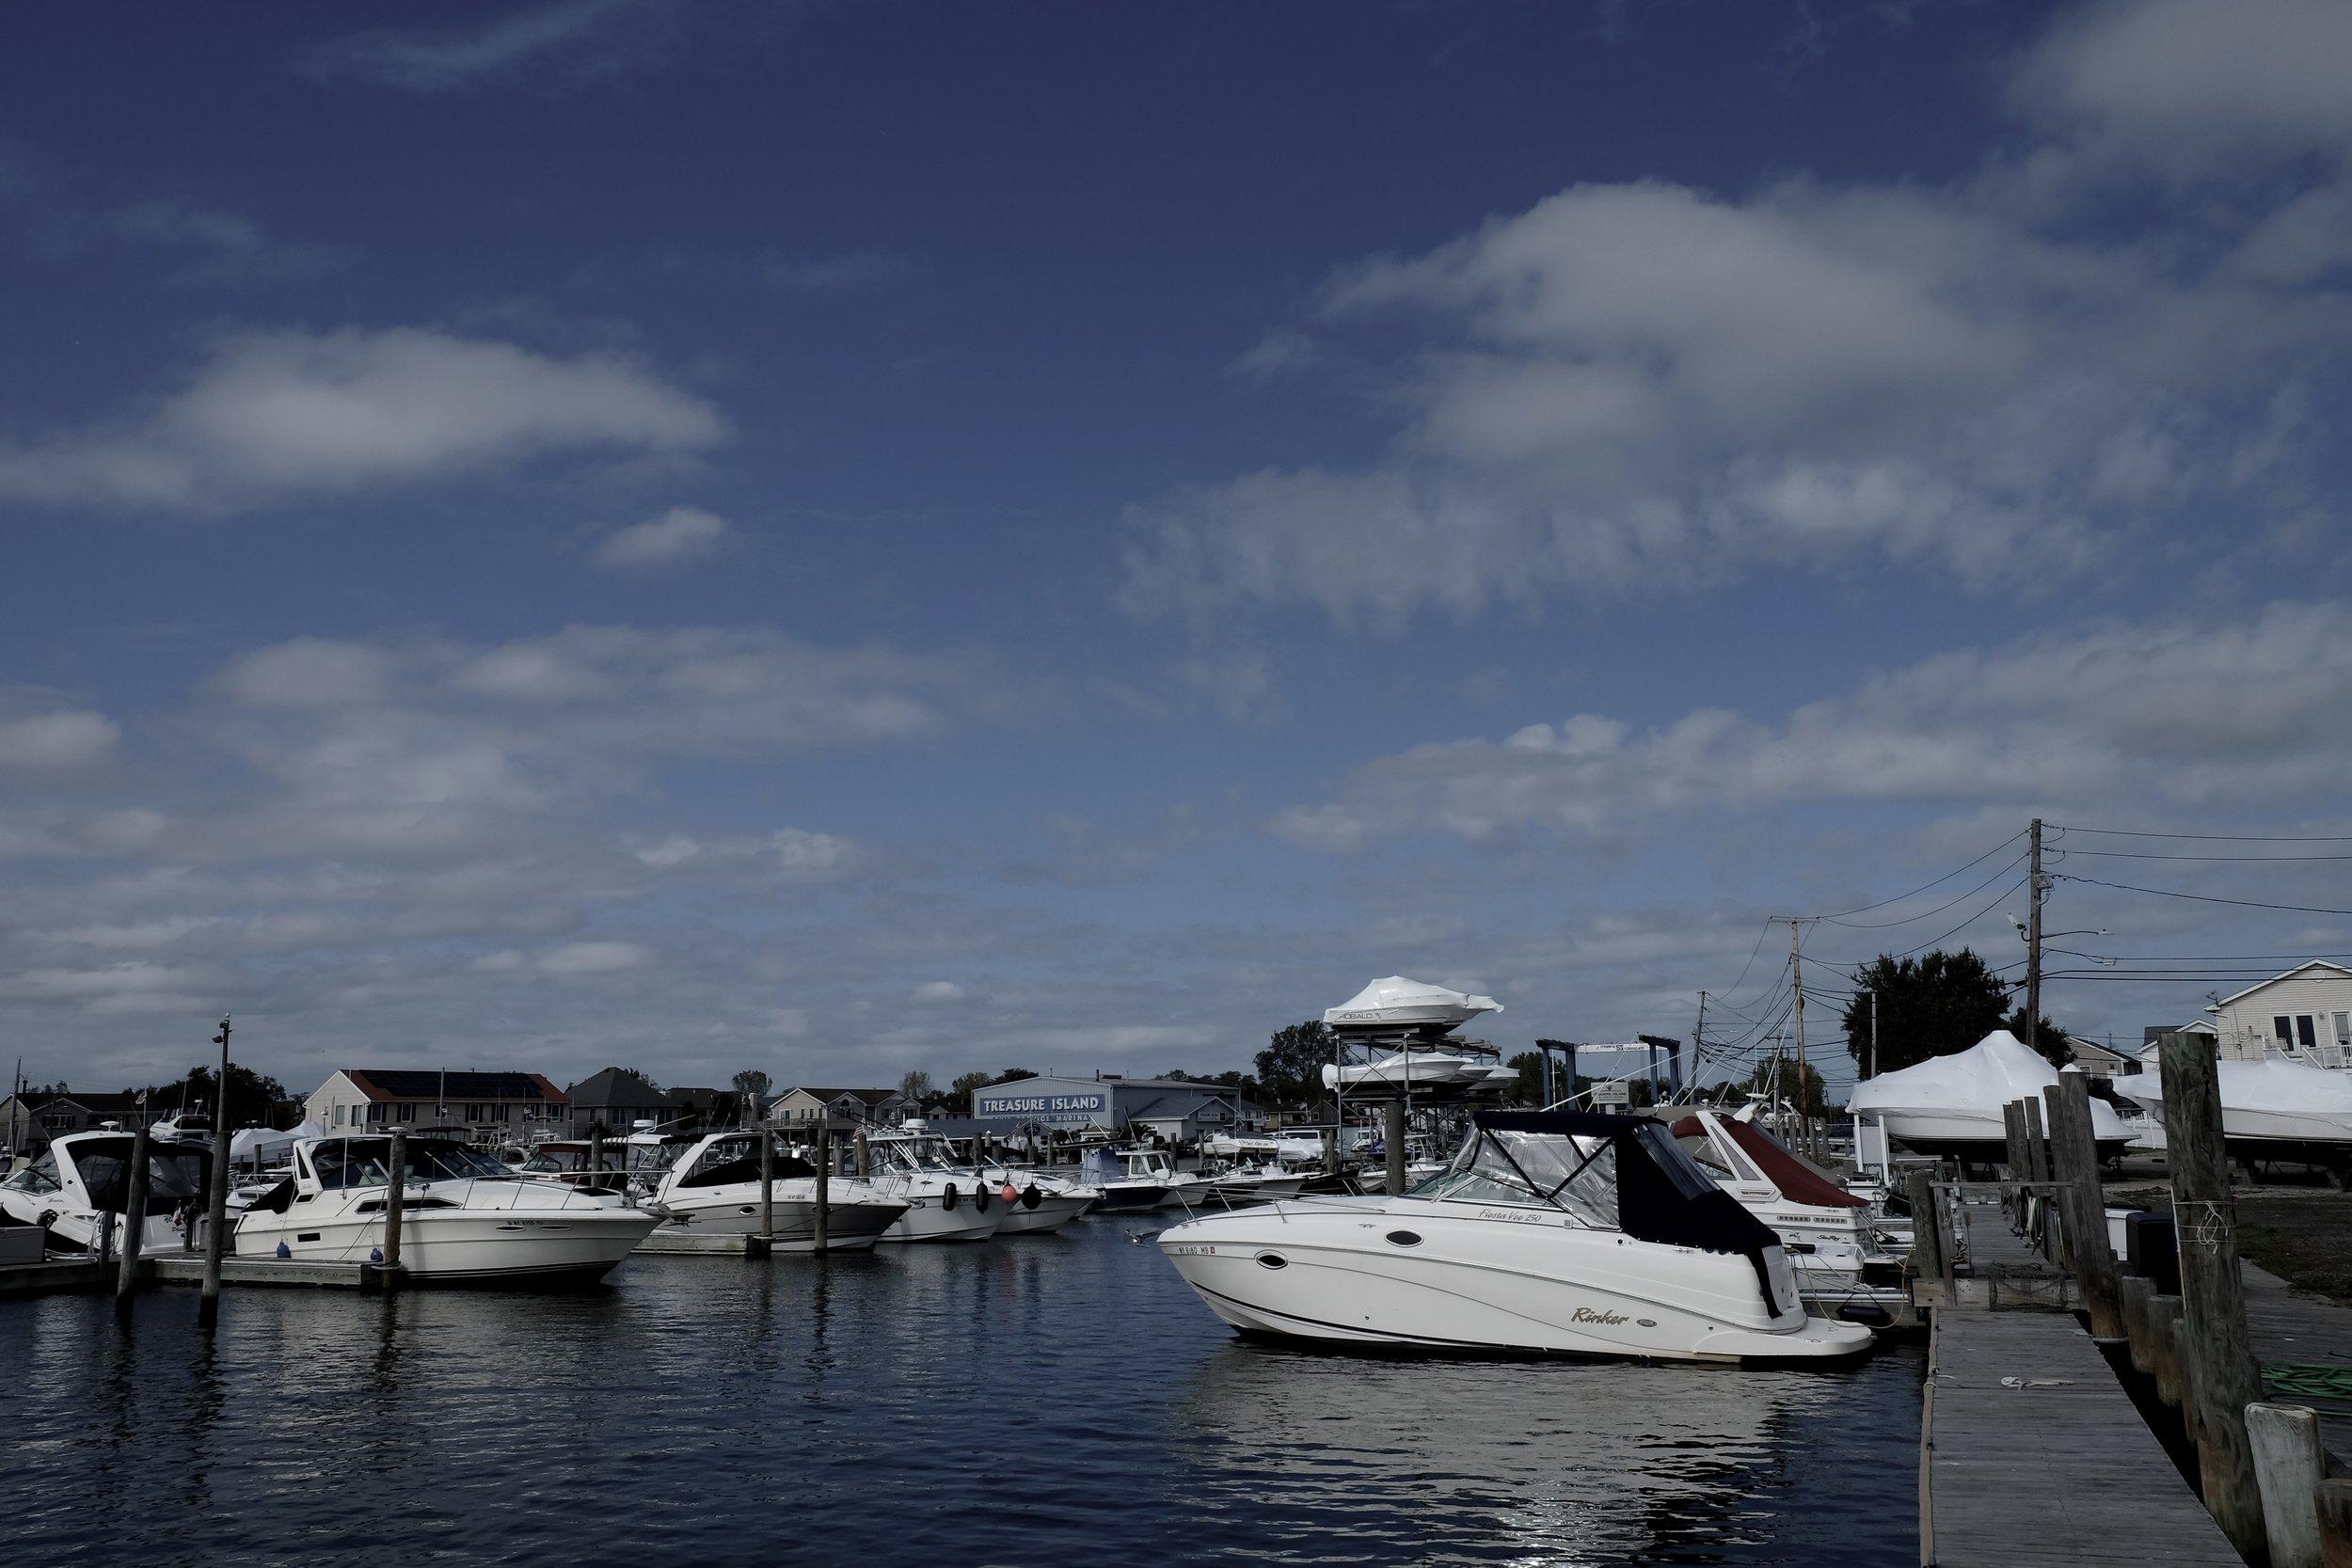 Seaford Marina